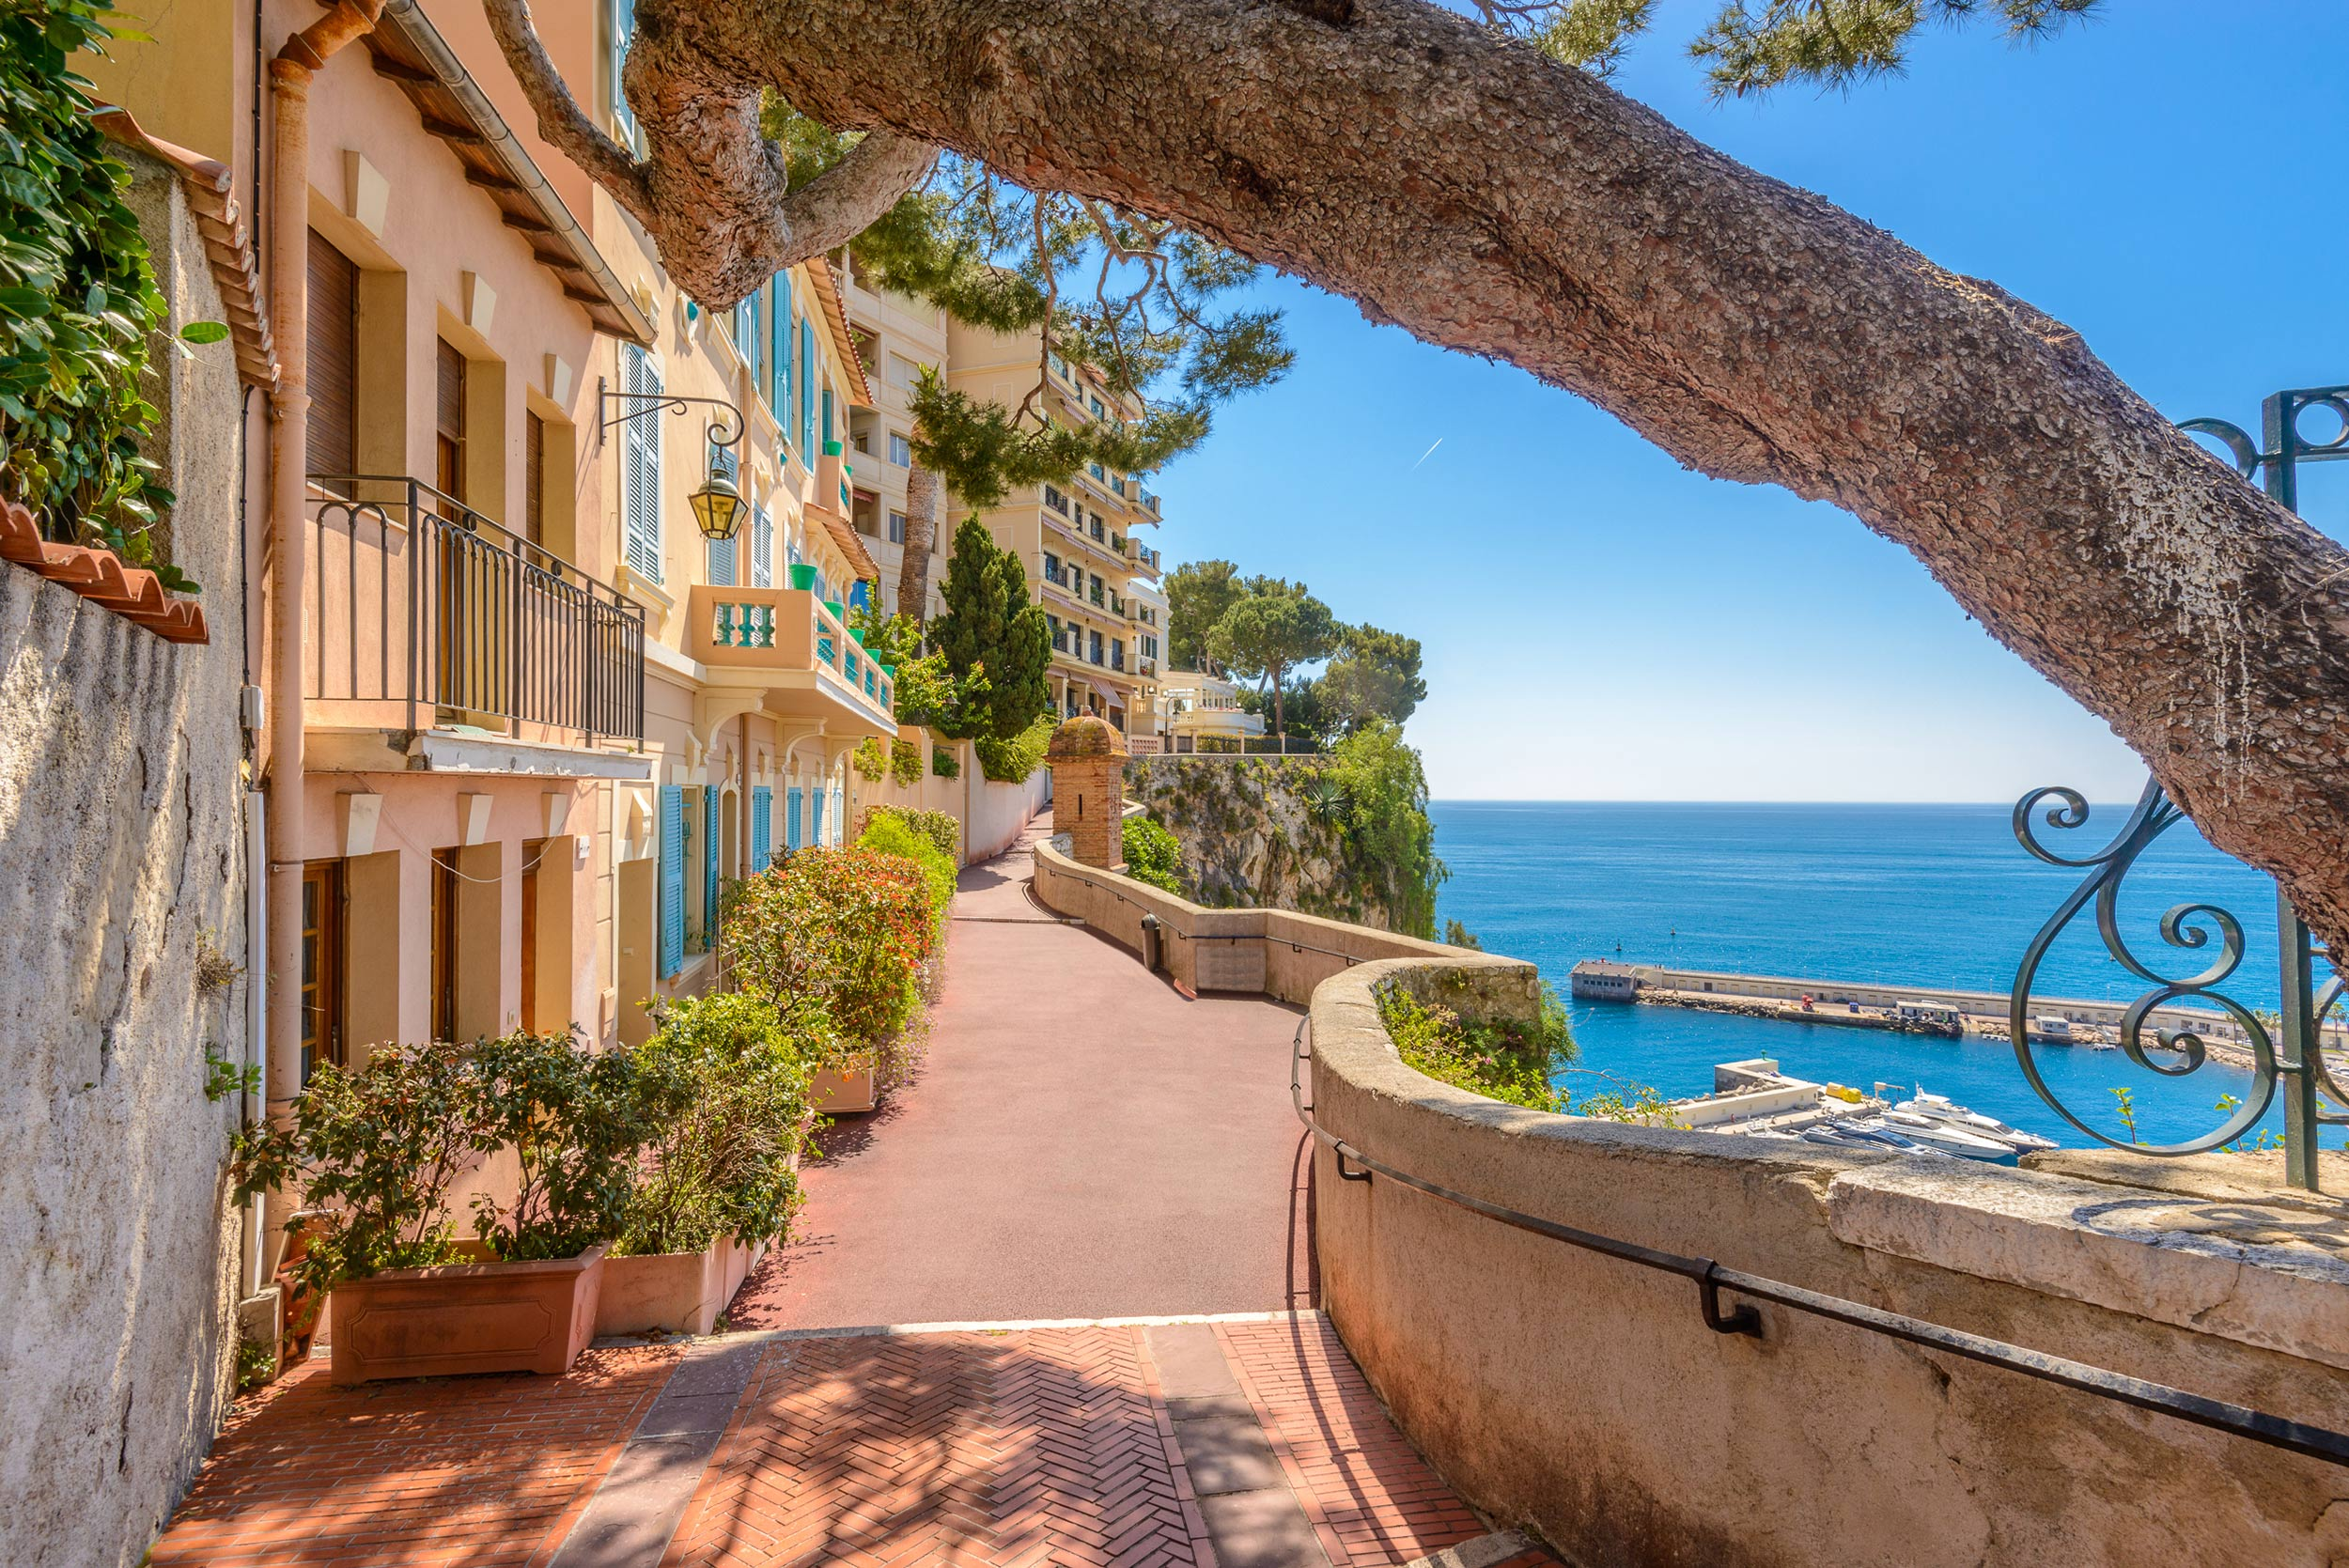 Costa Azzurra, Francia, Vacanze, Estate, Idee, Ispirazioni, Stile